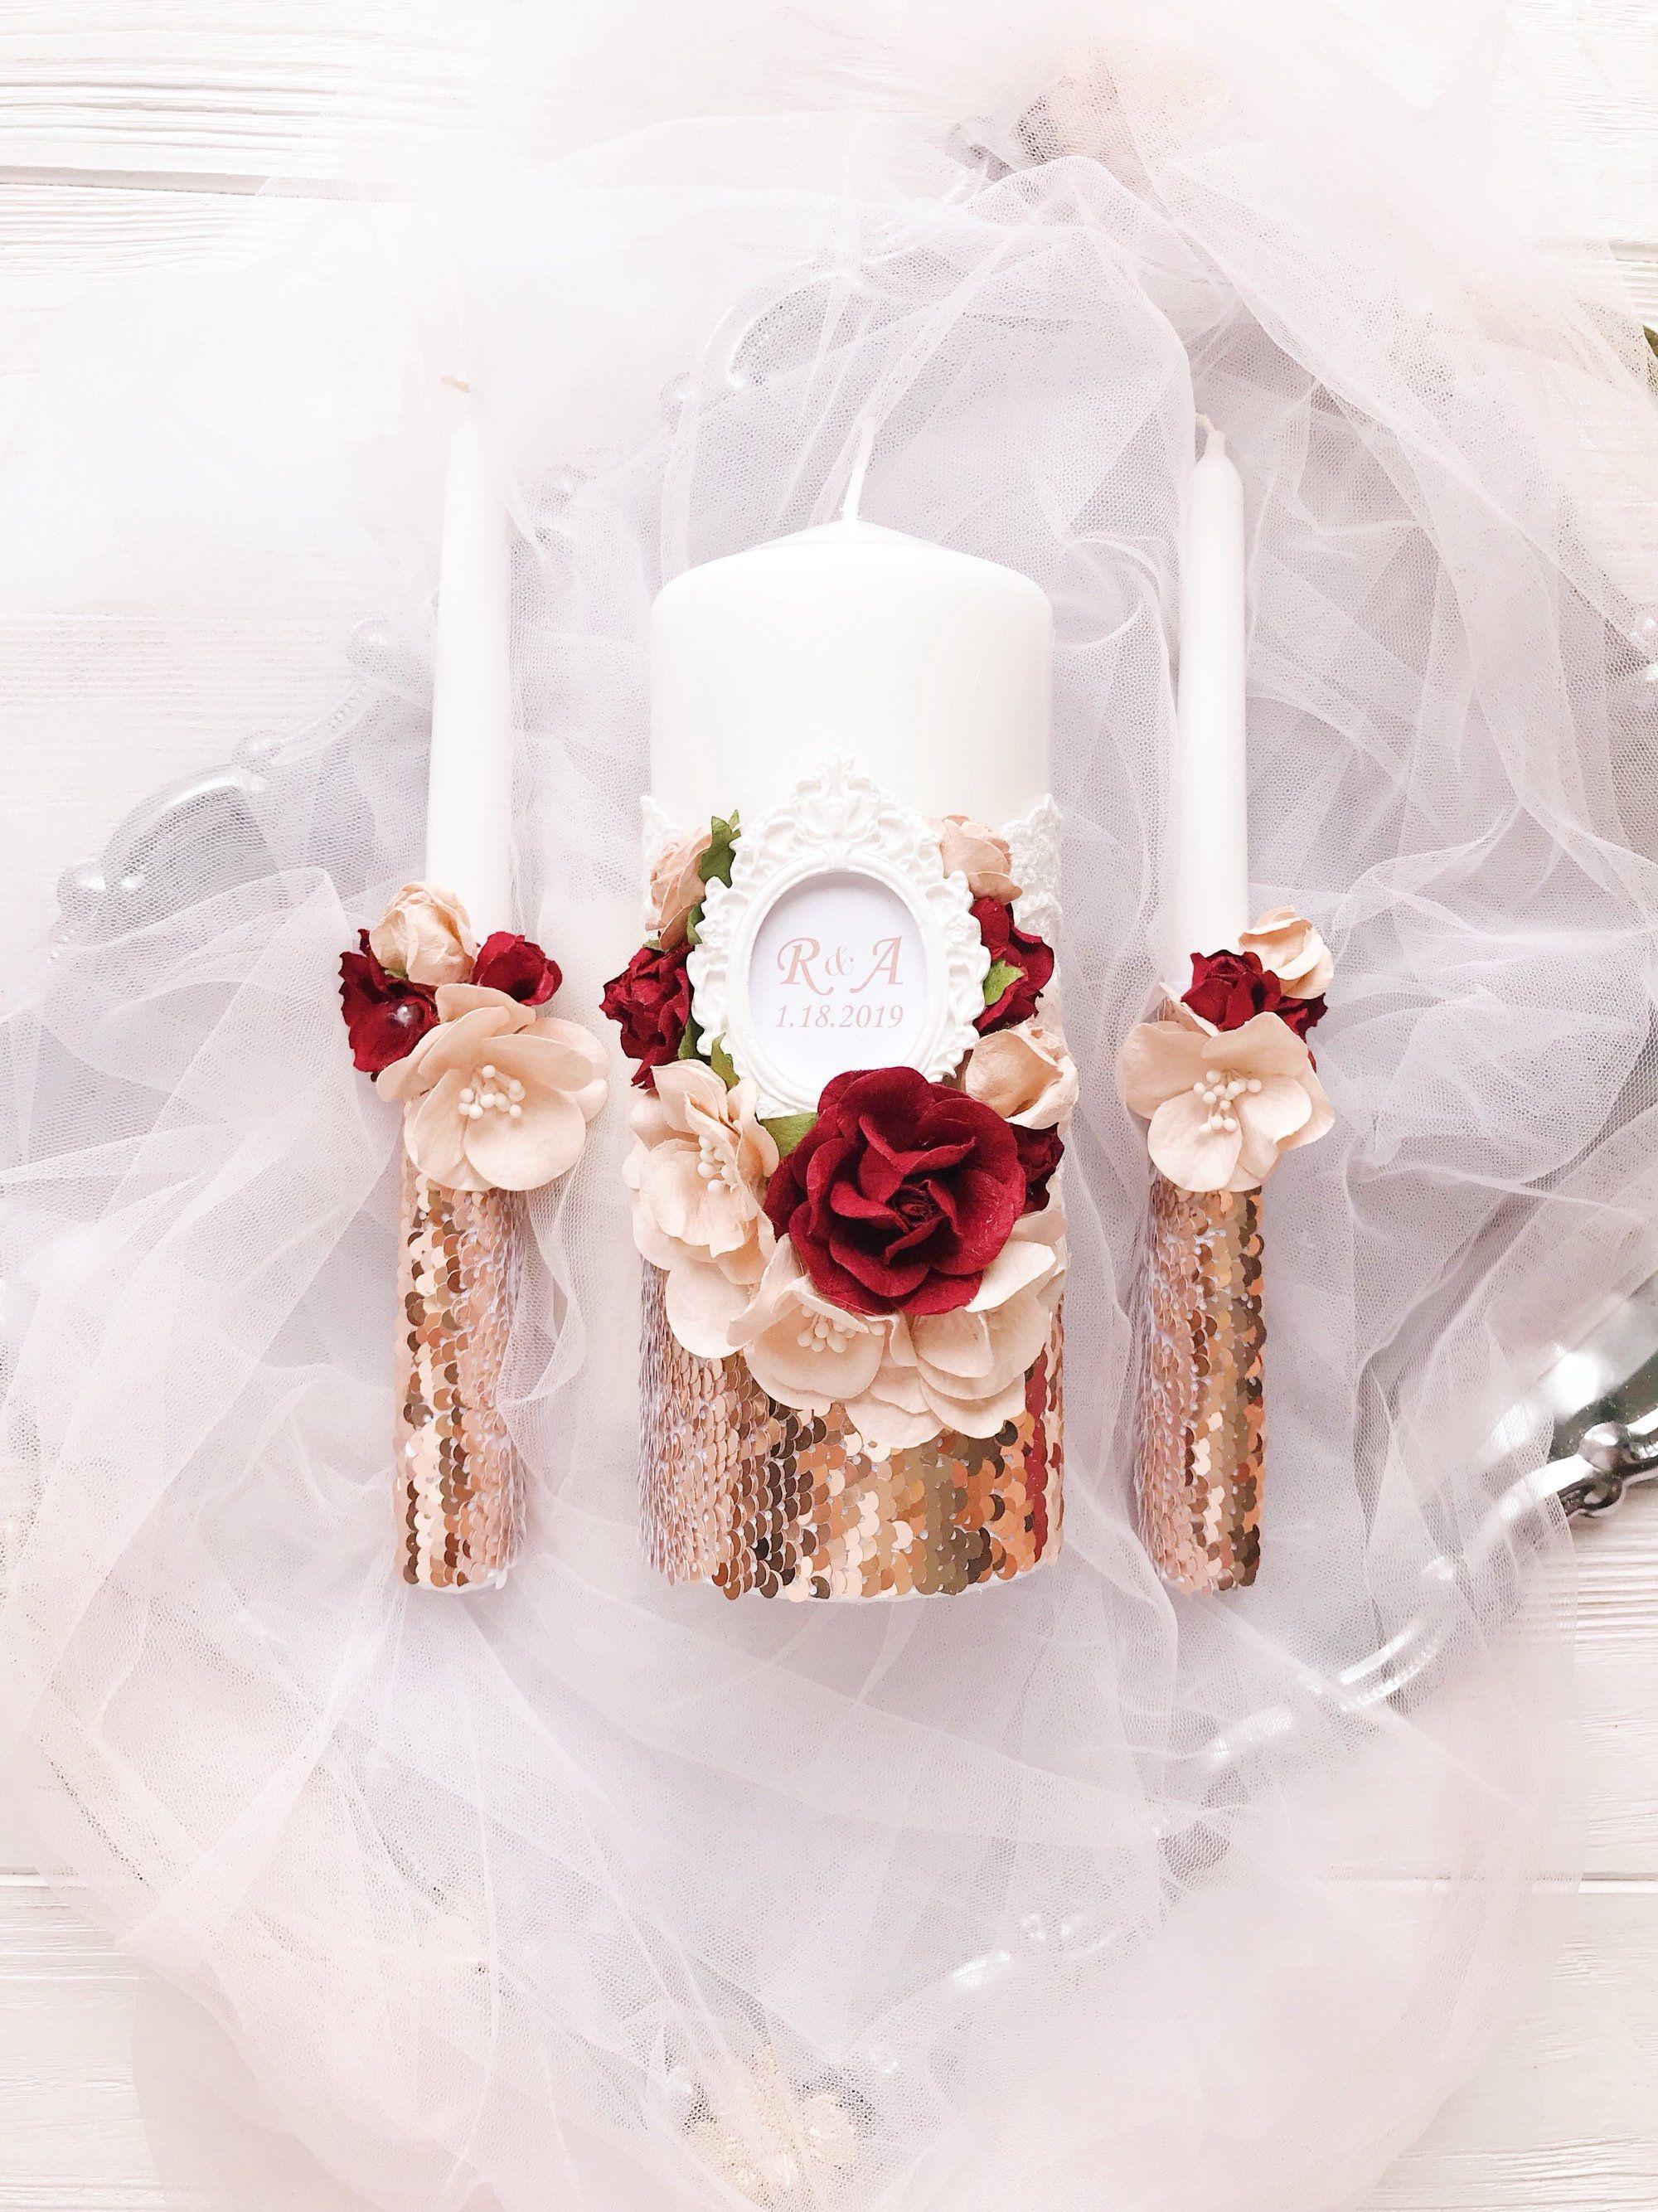 Rose Gold Wedding Candles Rose Gold Wedding Unity Candle Set Burgundy Unity Candles Personalized Wedding Candles